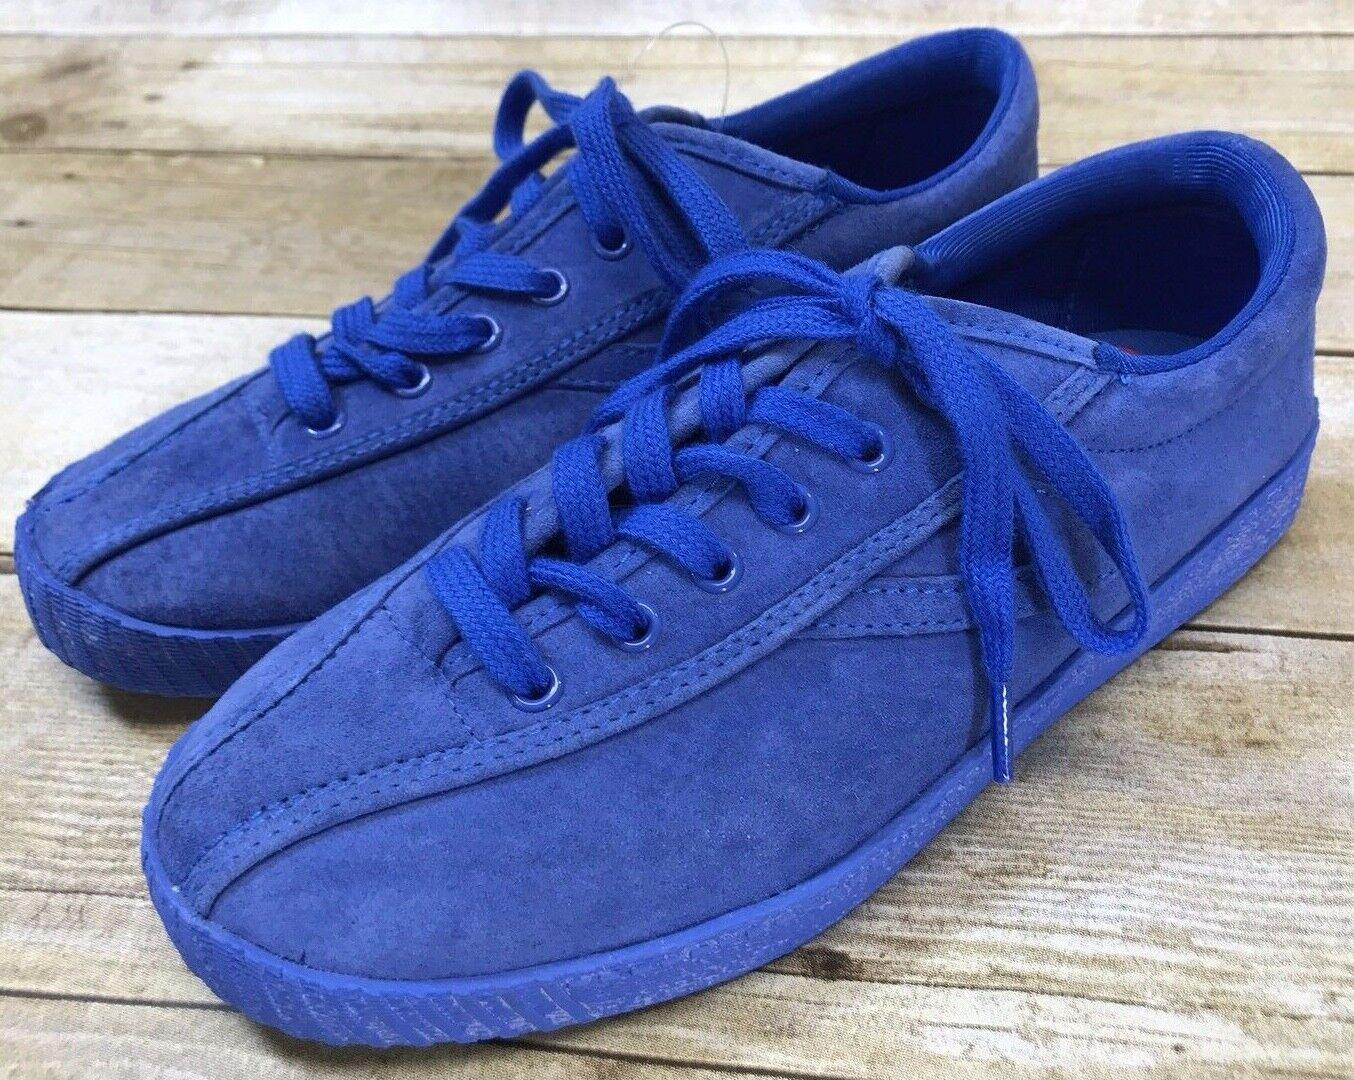 Tretorn Women's Nylite3 Plus Fashion Sneaker bluee Suede Size 6 Brand New